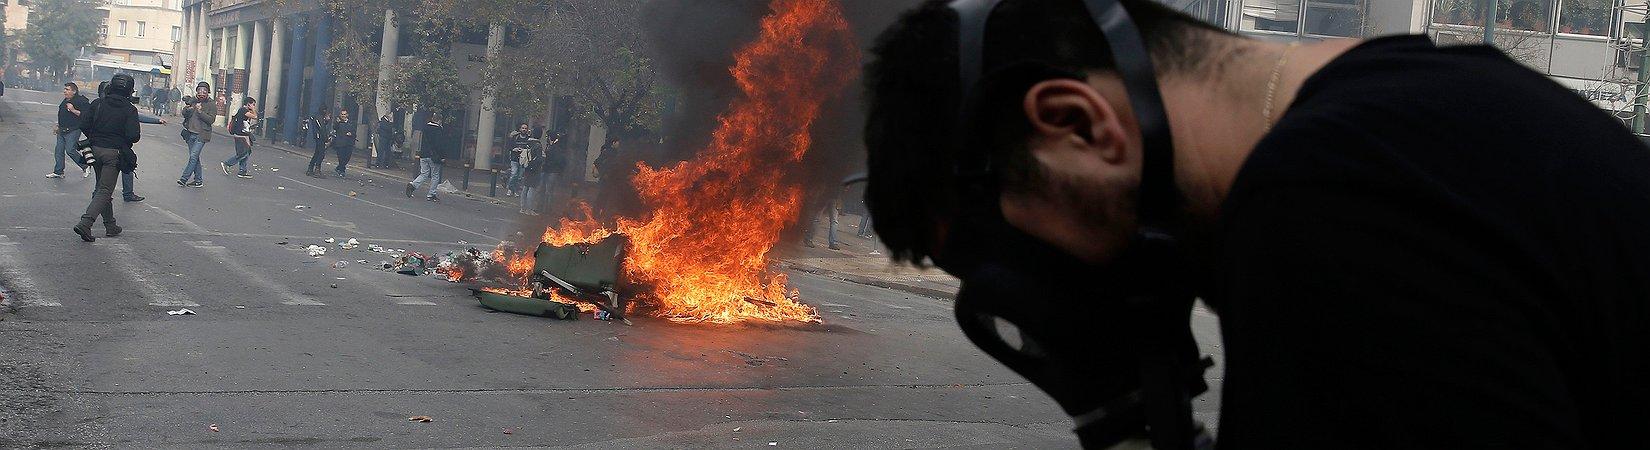 FOTO: Griechische Proteste